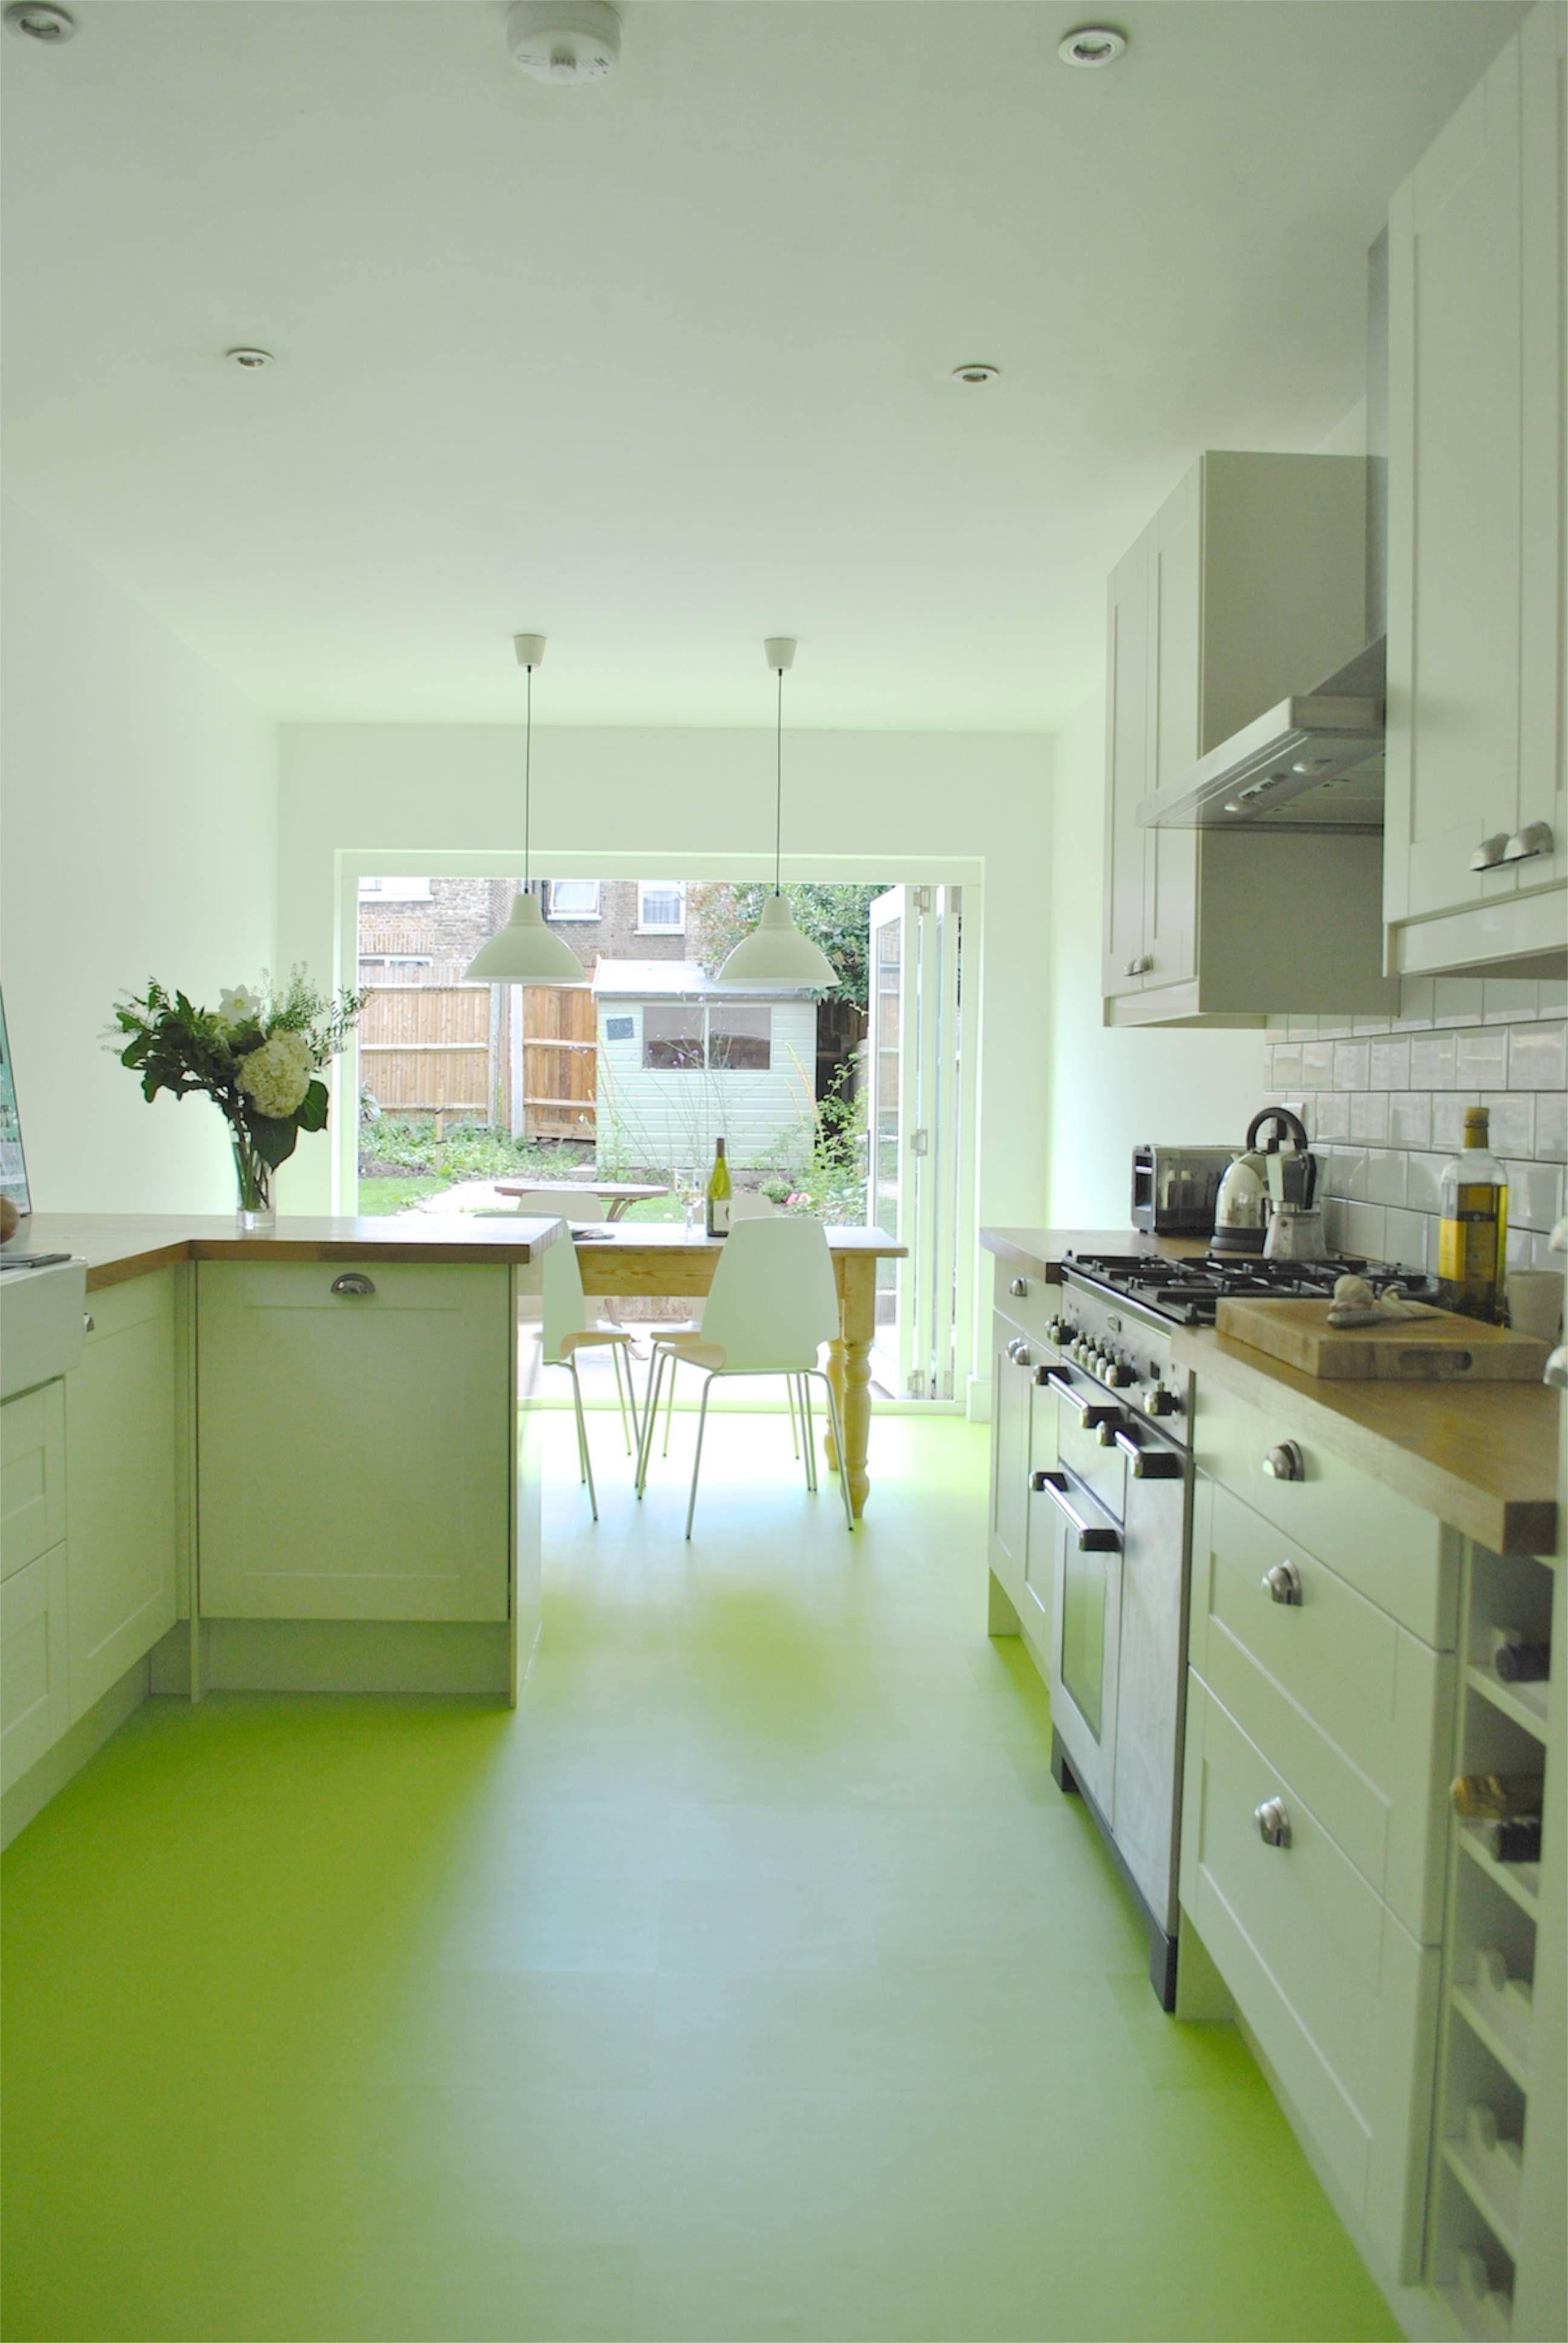 Lime green kitchen floor tiles httpweb4top pinterest lime green kitchen floor tiles dailygadgetfo Gallery